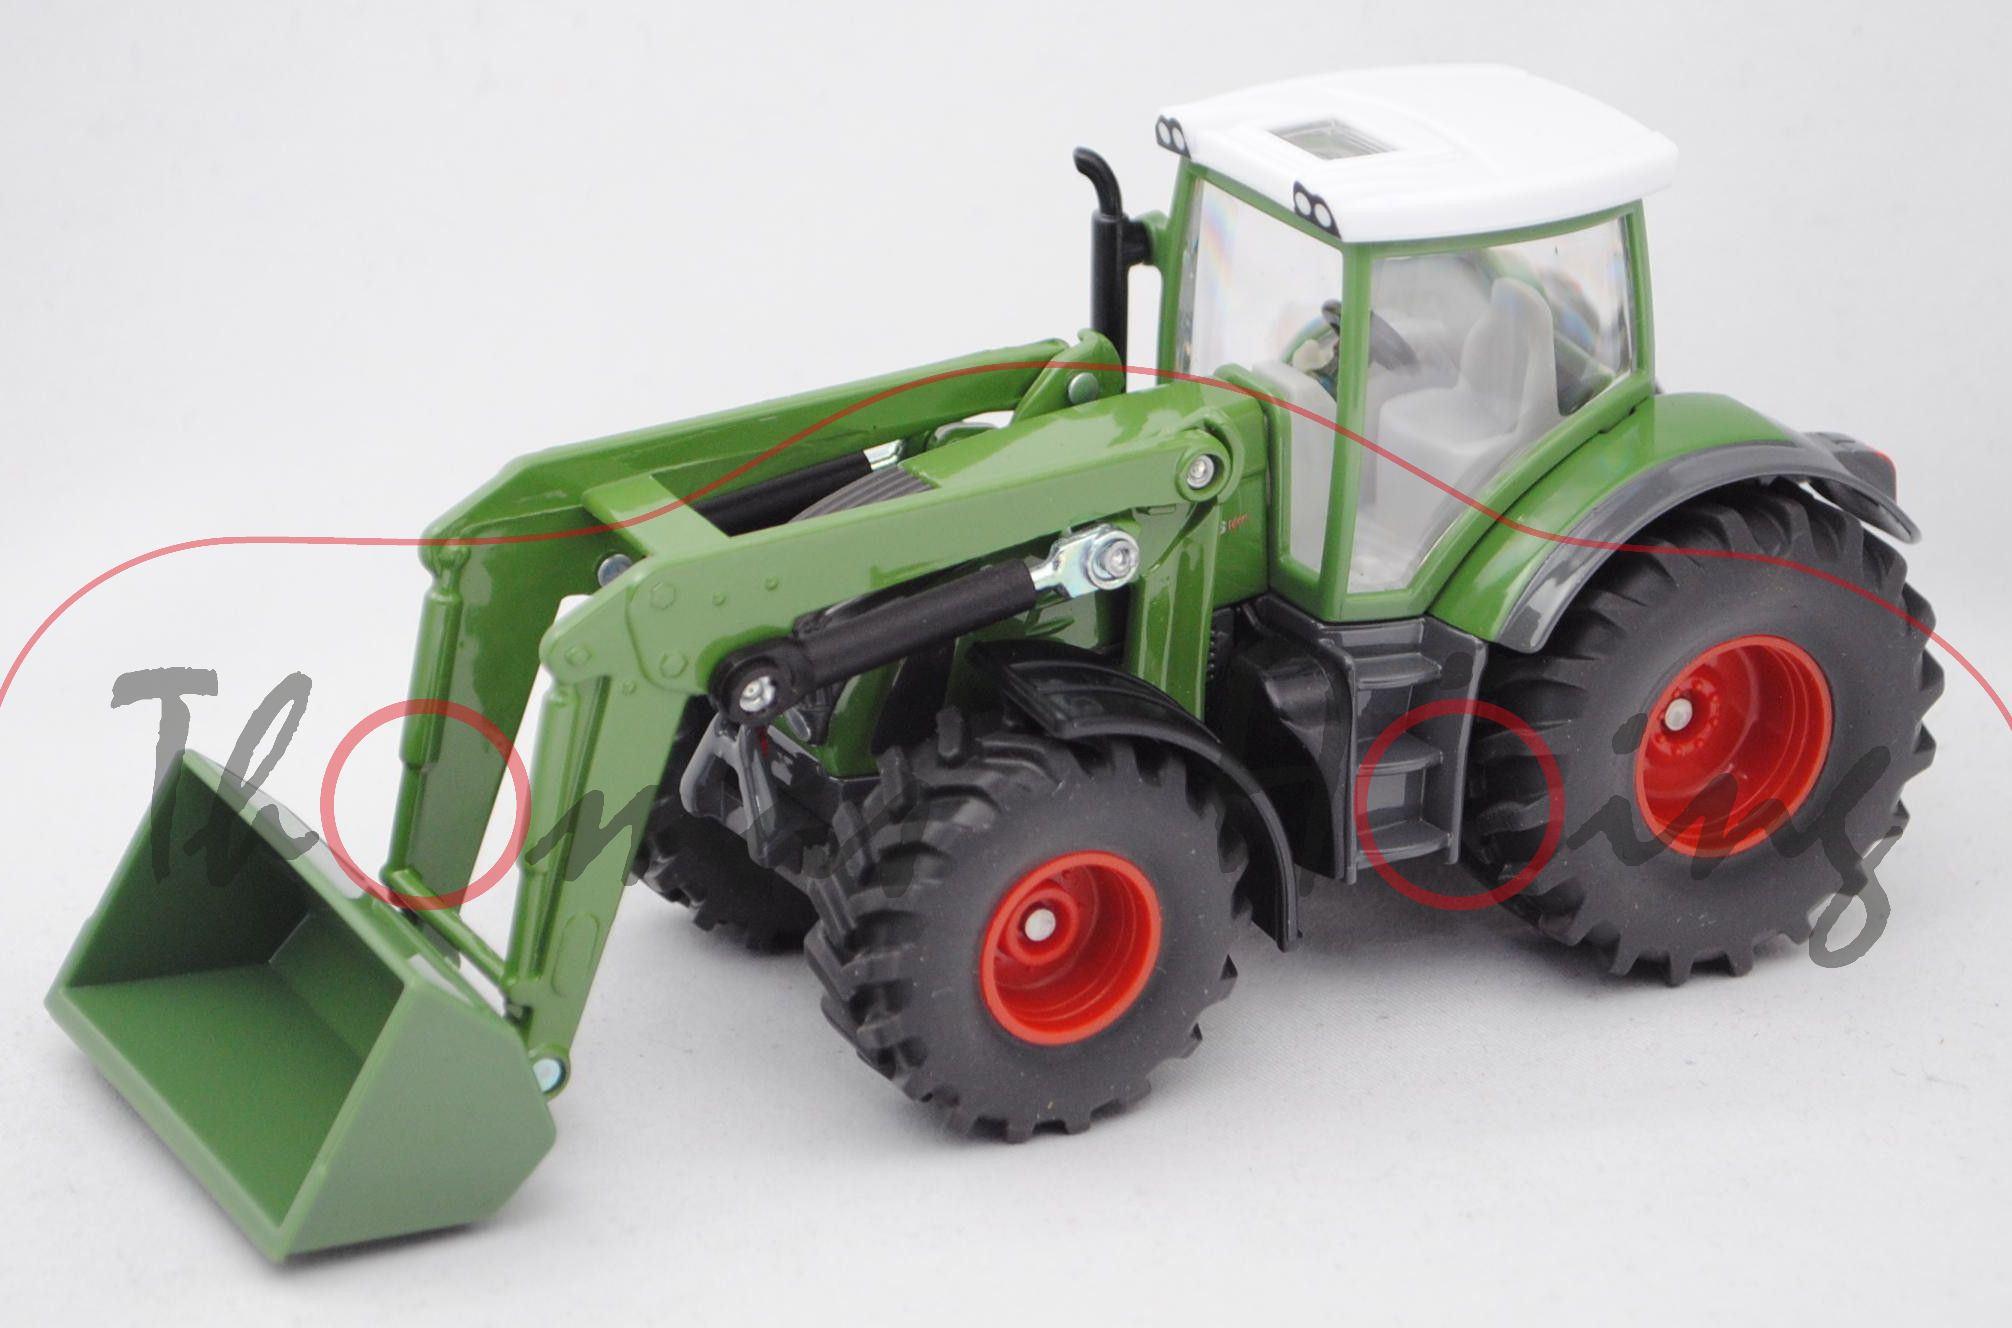 Ck modelcars fendt vario mit frontlader grün